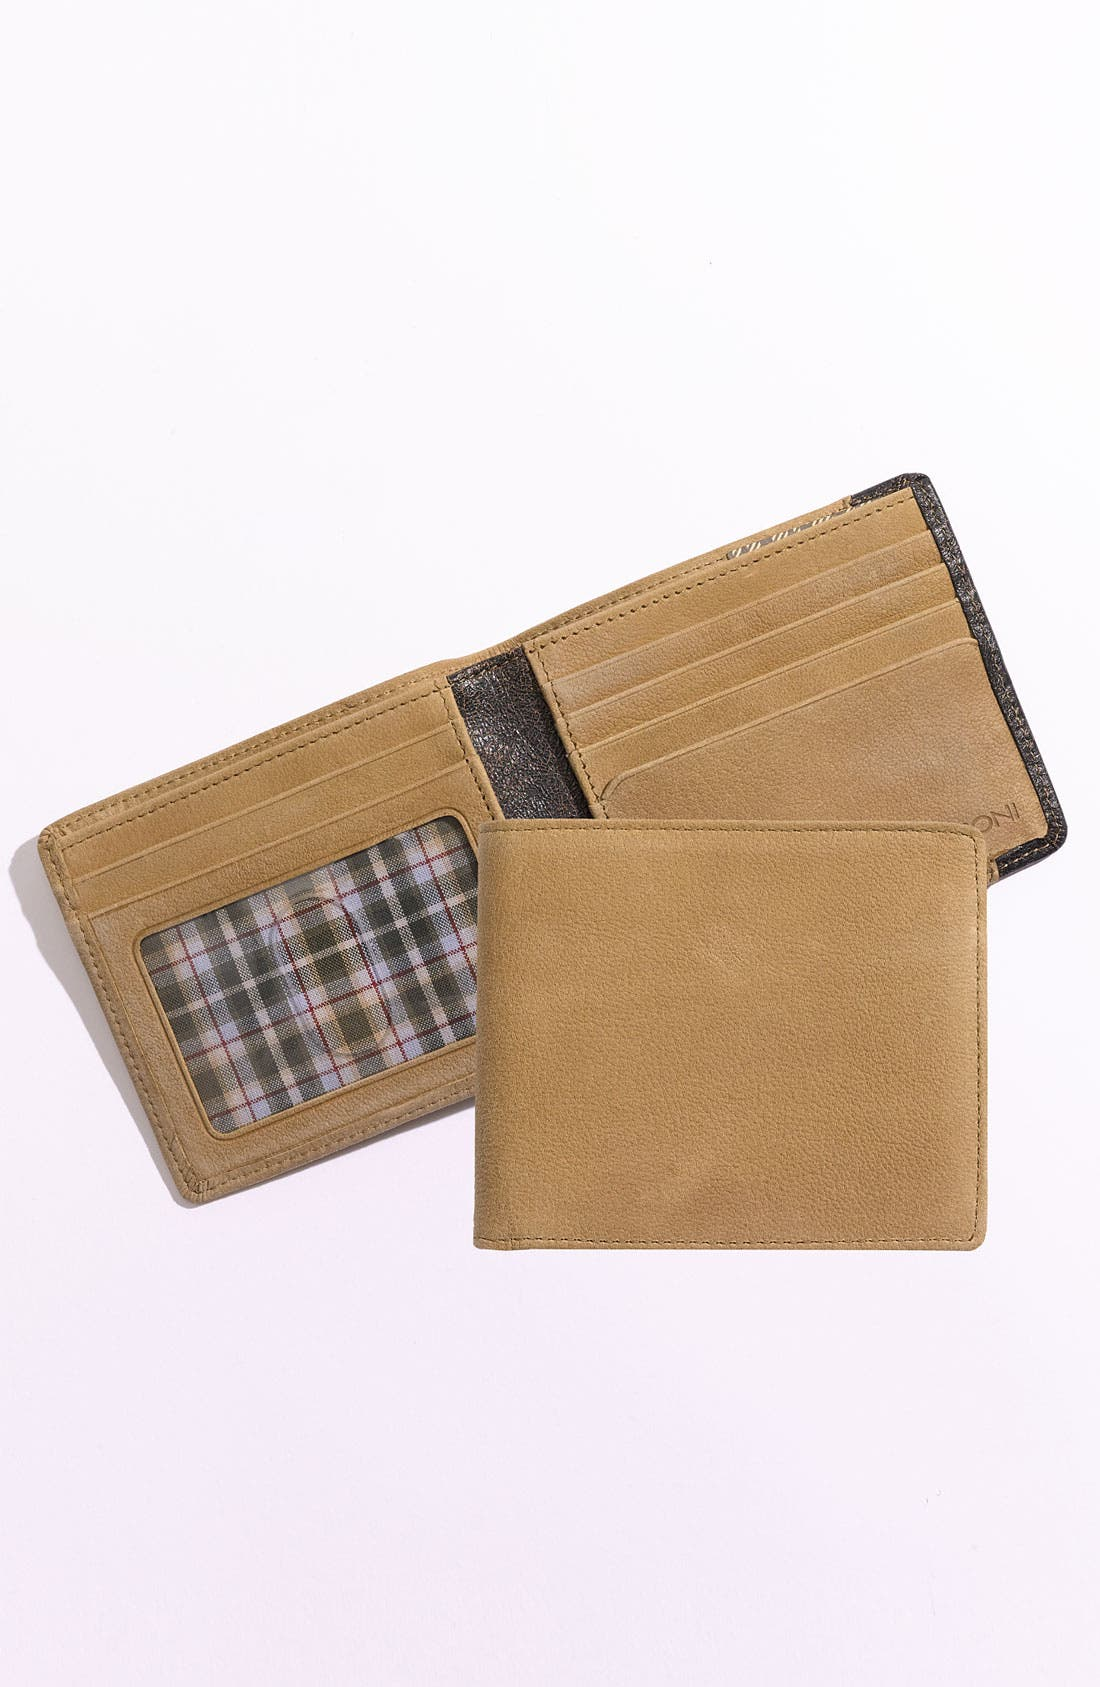 Alternate Image 1 Selected - Boconi 'Leon' Slimfold Wallet